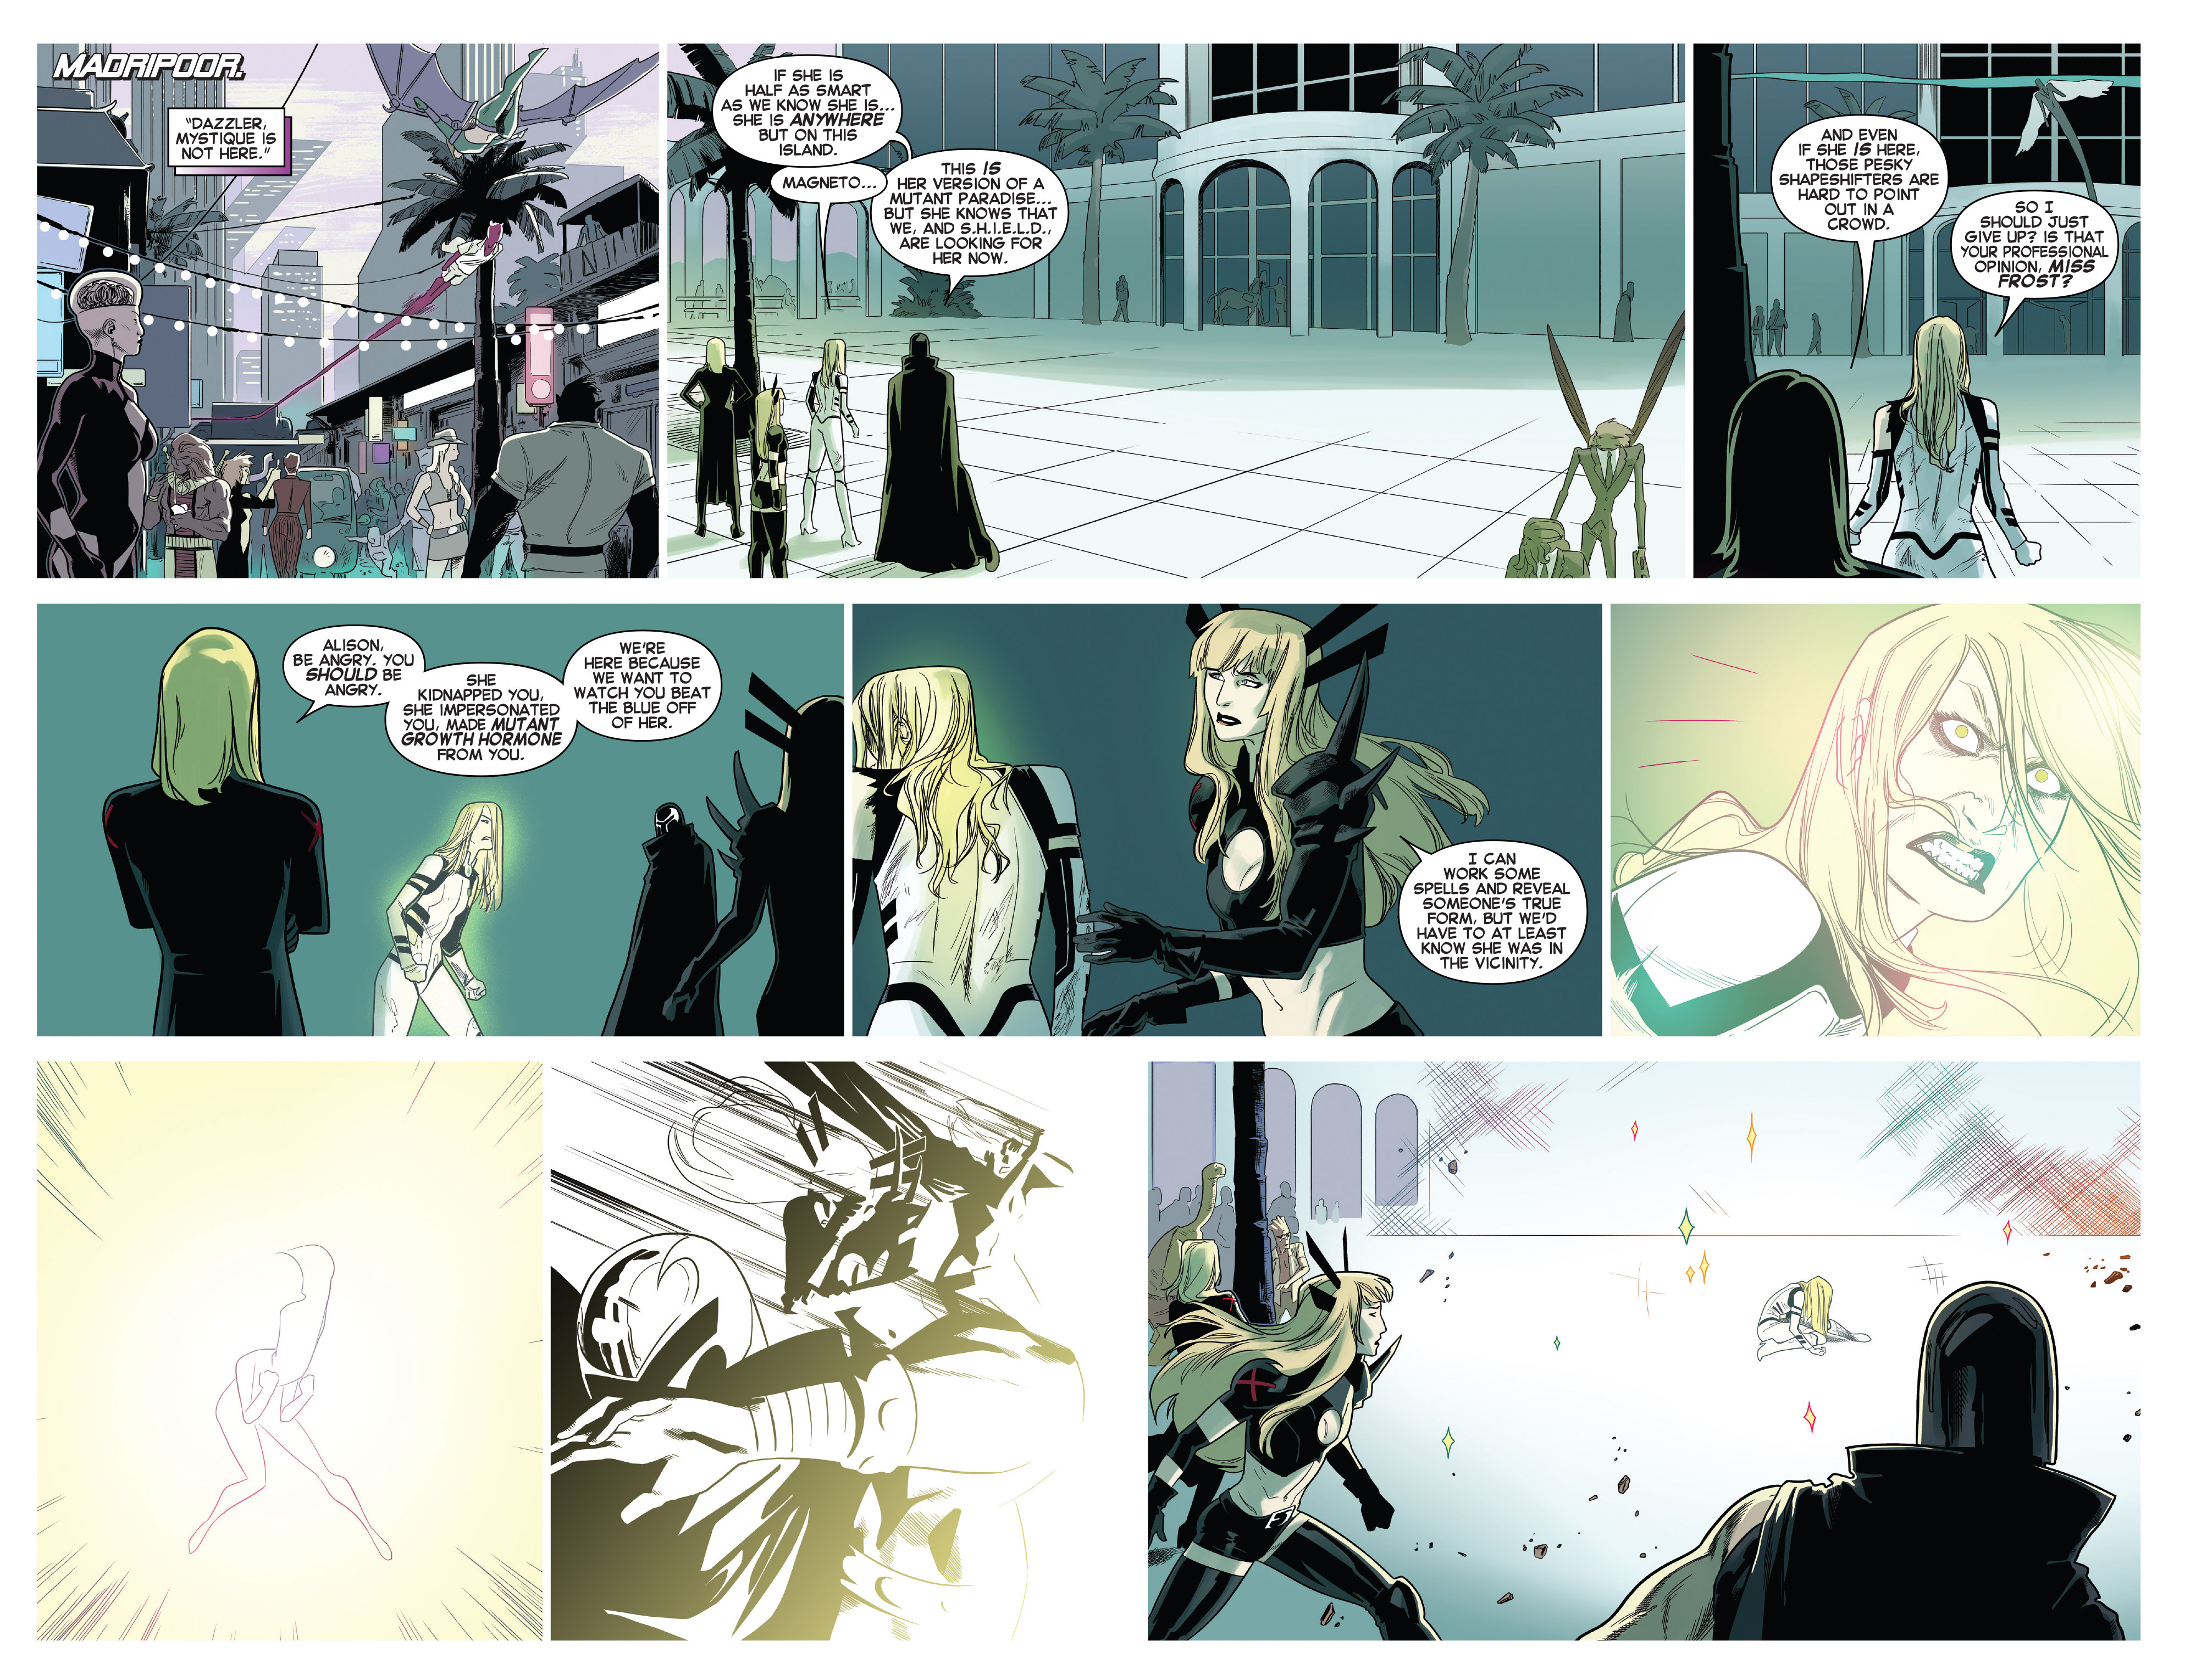 Read online Uncanny X-Men (2013) comic -  Issue # _TPB 4 - vs. S.H.I.E.L.D - 86